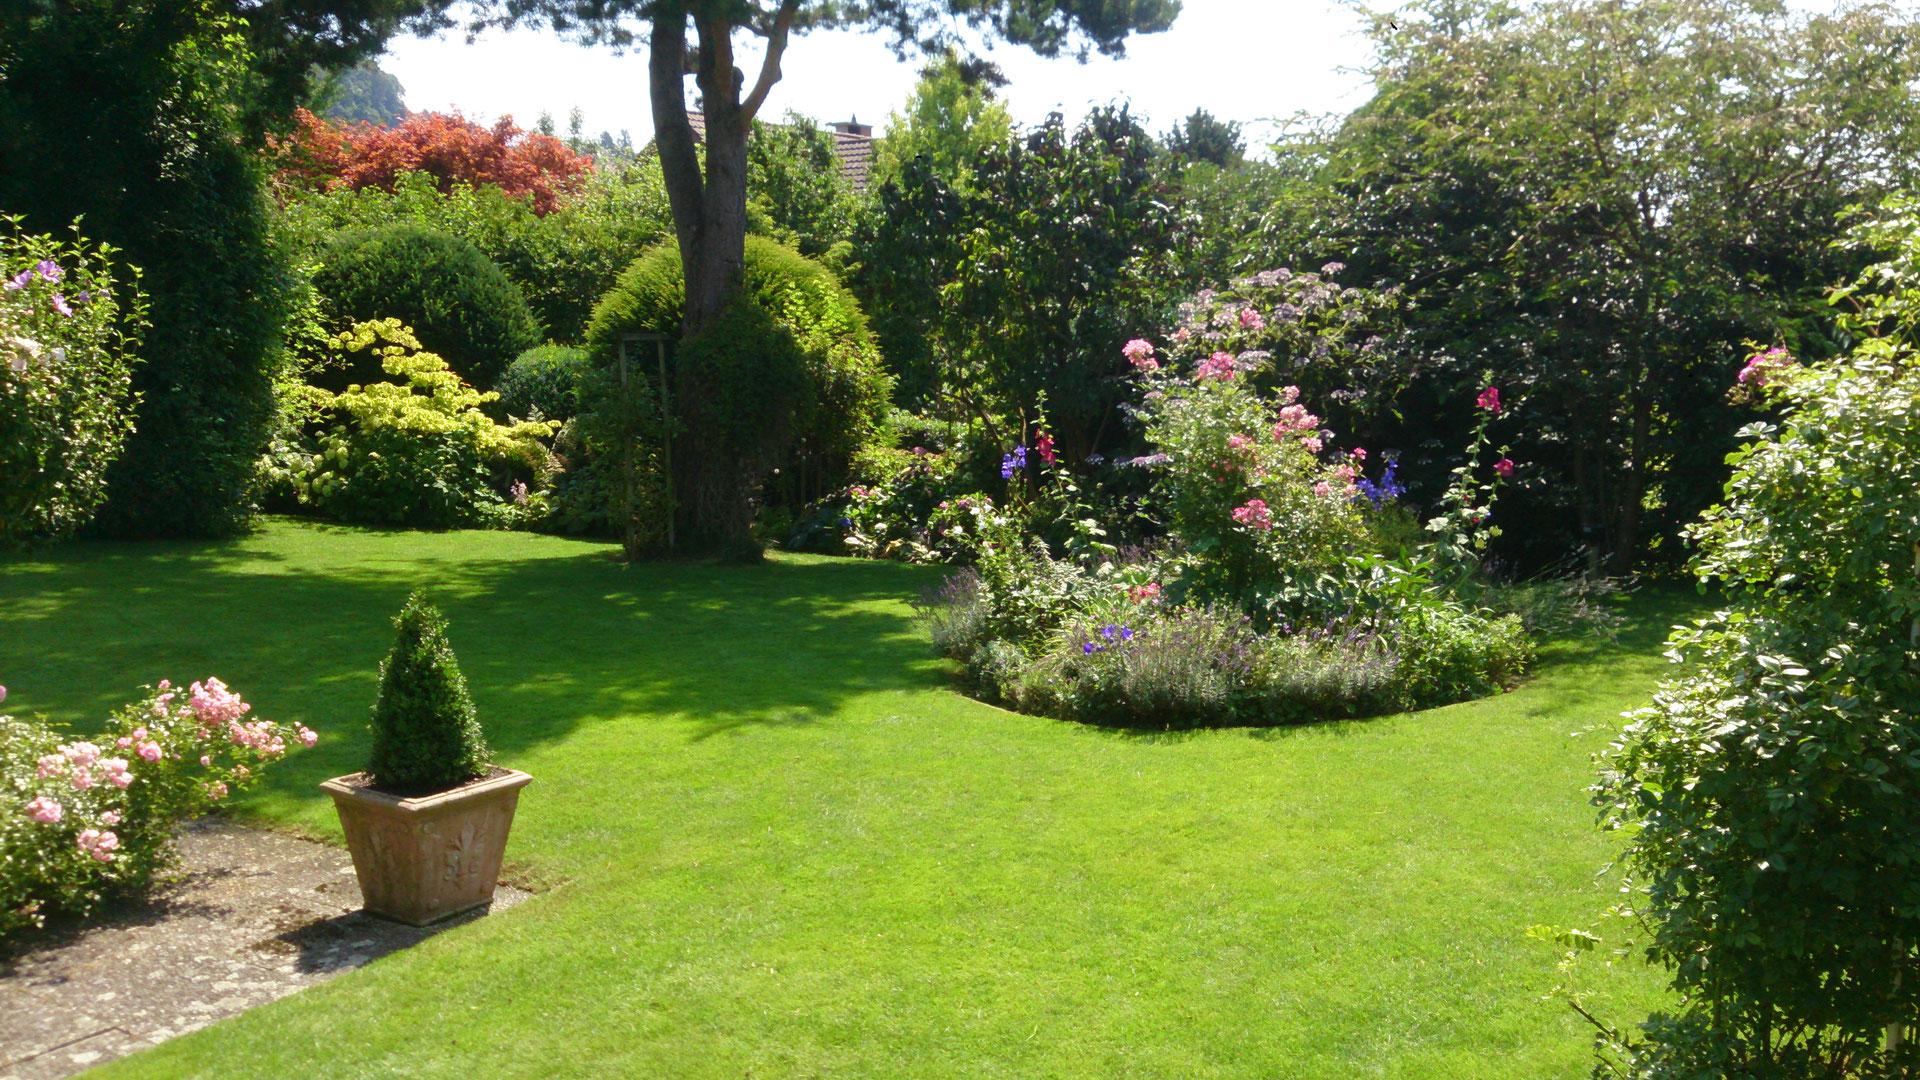 Willkommen hartmann gartenbau gmbh winterthur for Gartengestaltung app